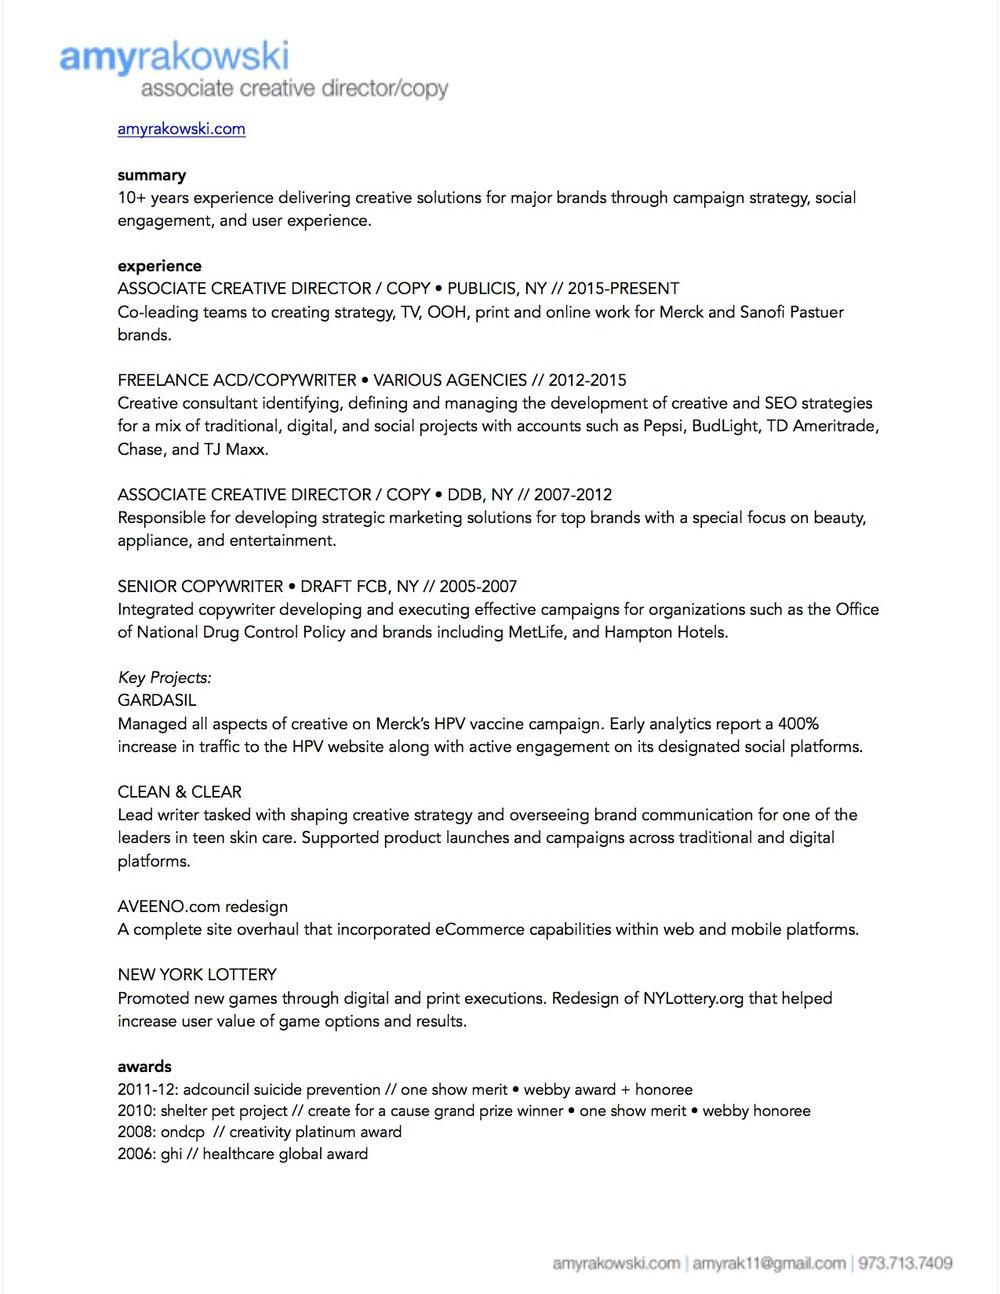 resume — amy rakowski